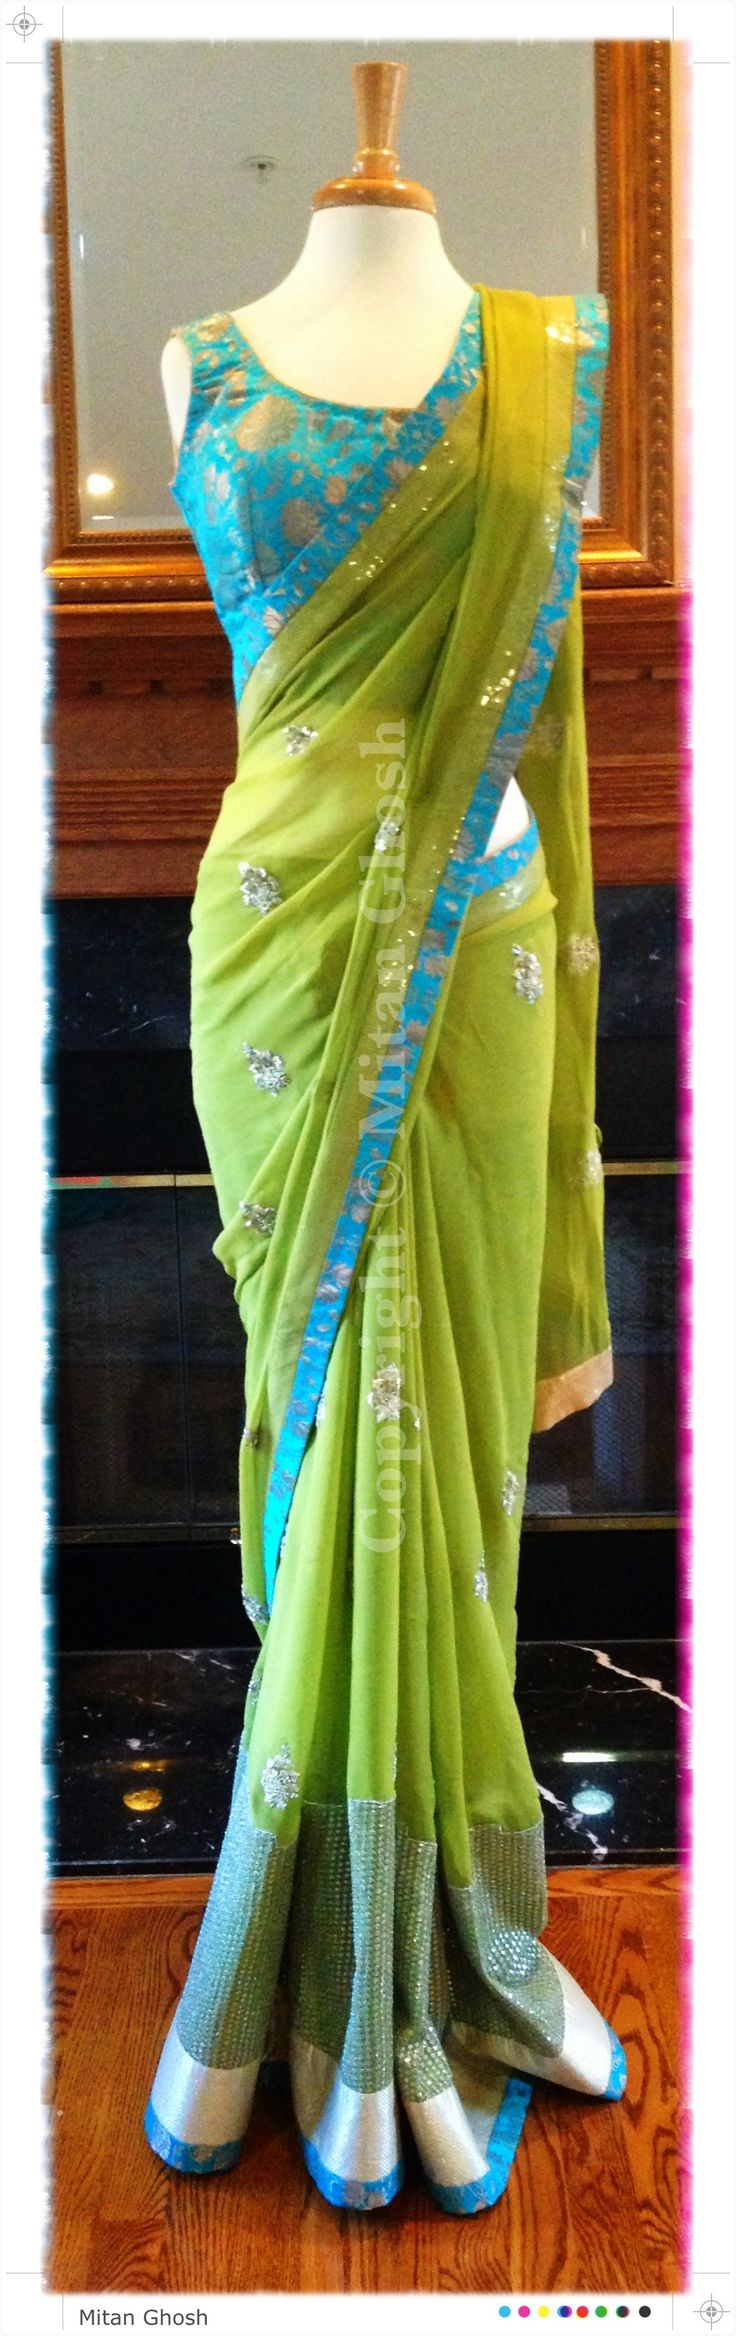 Green georgette saree with dabka motifs. Blouse is made of Banarsi khinkhwaab.